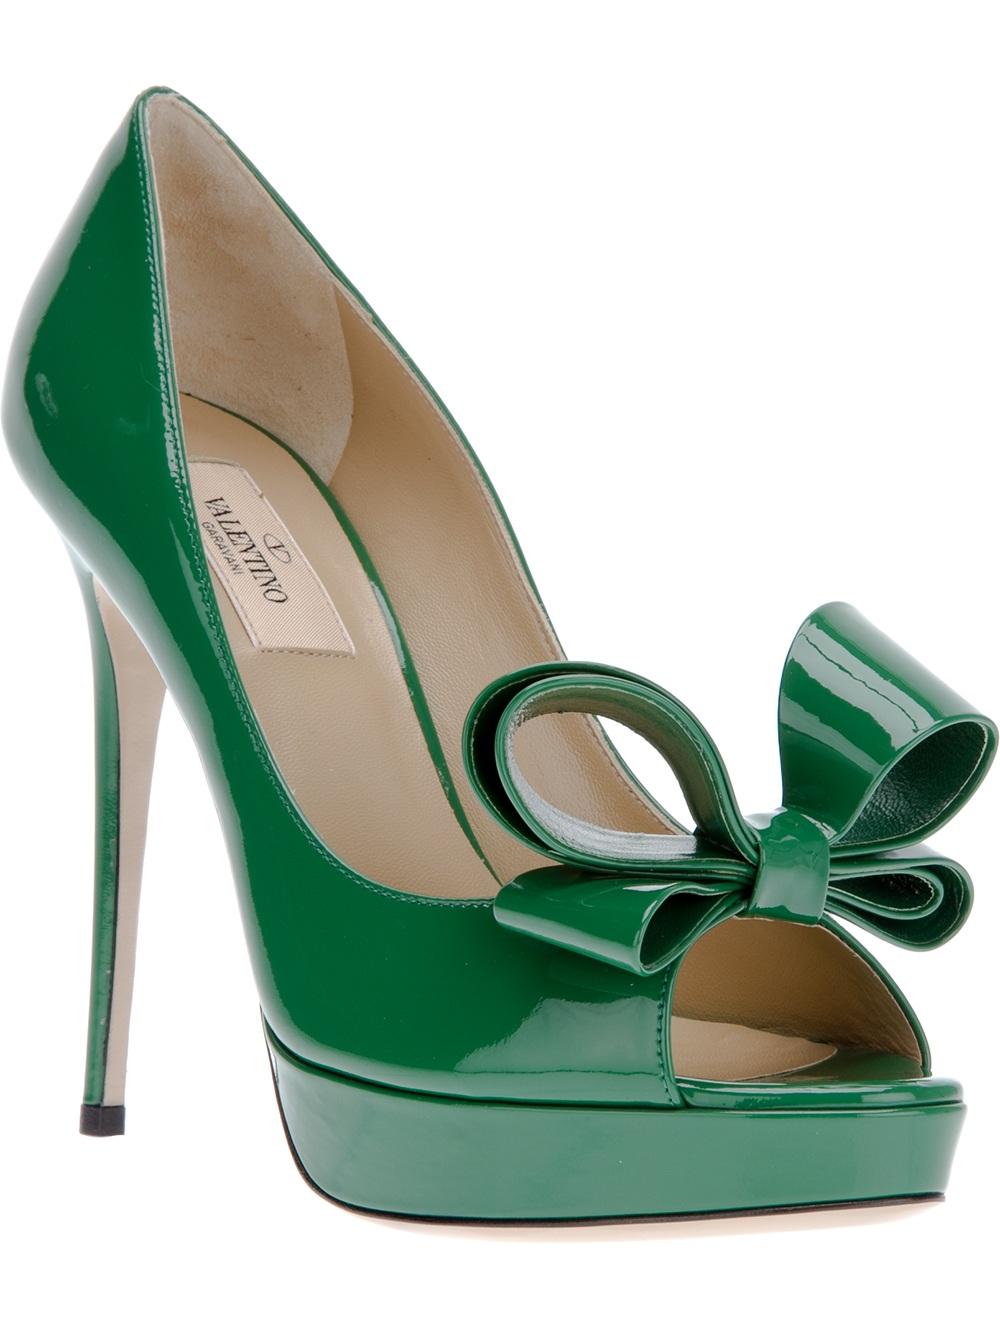 5260ede48750 Shoeniverse  VALENTINO Green Peep Toe Bow Pump